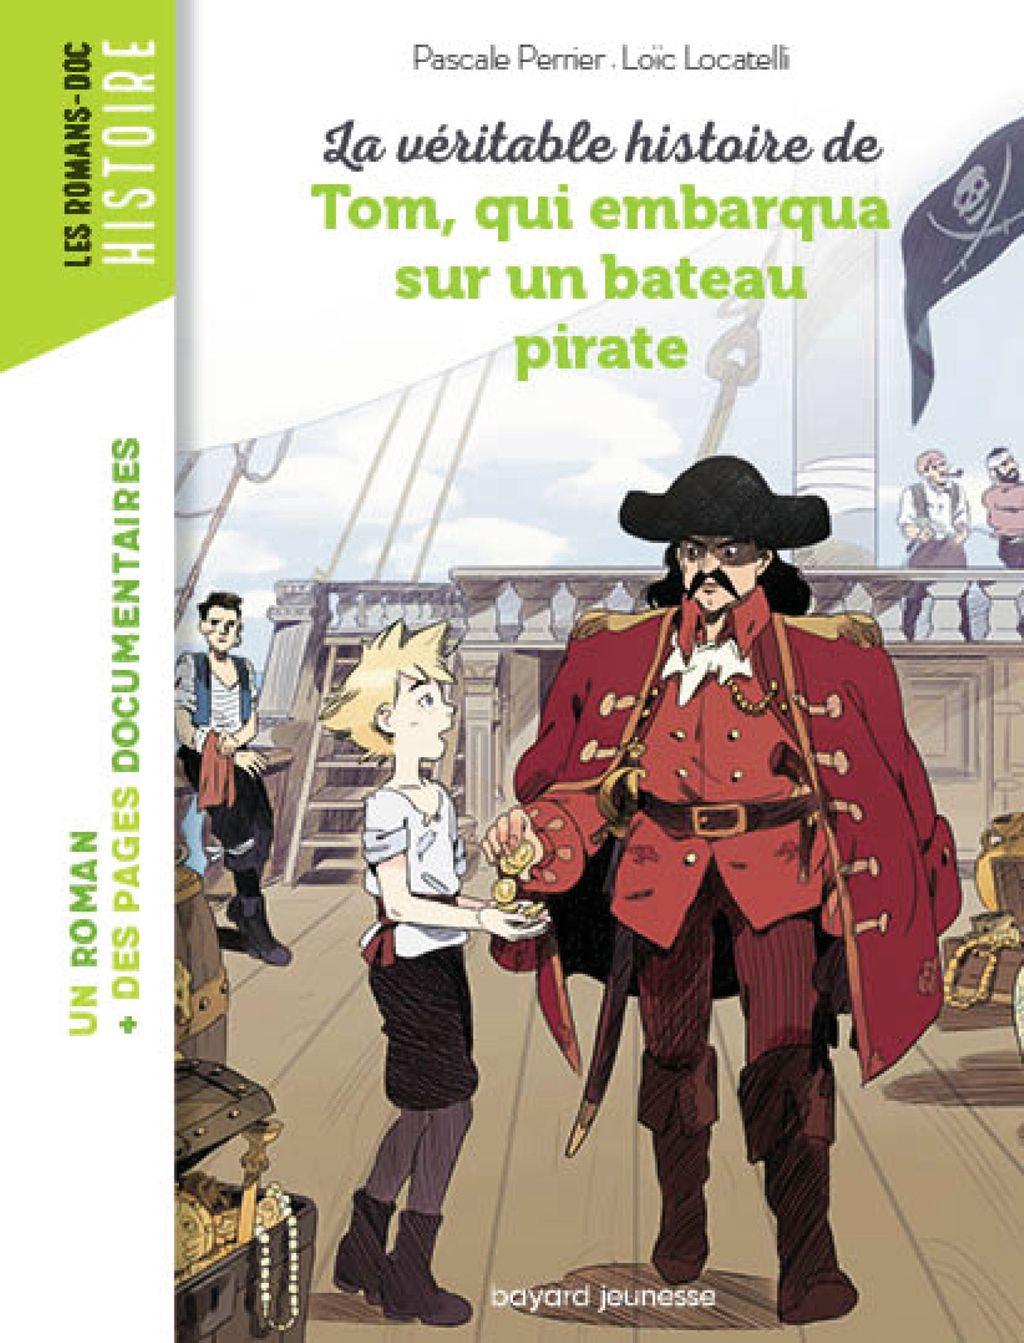 «La véritable histoire de Tom, qui embarqua sur un bateau pirate» cover